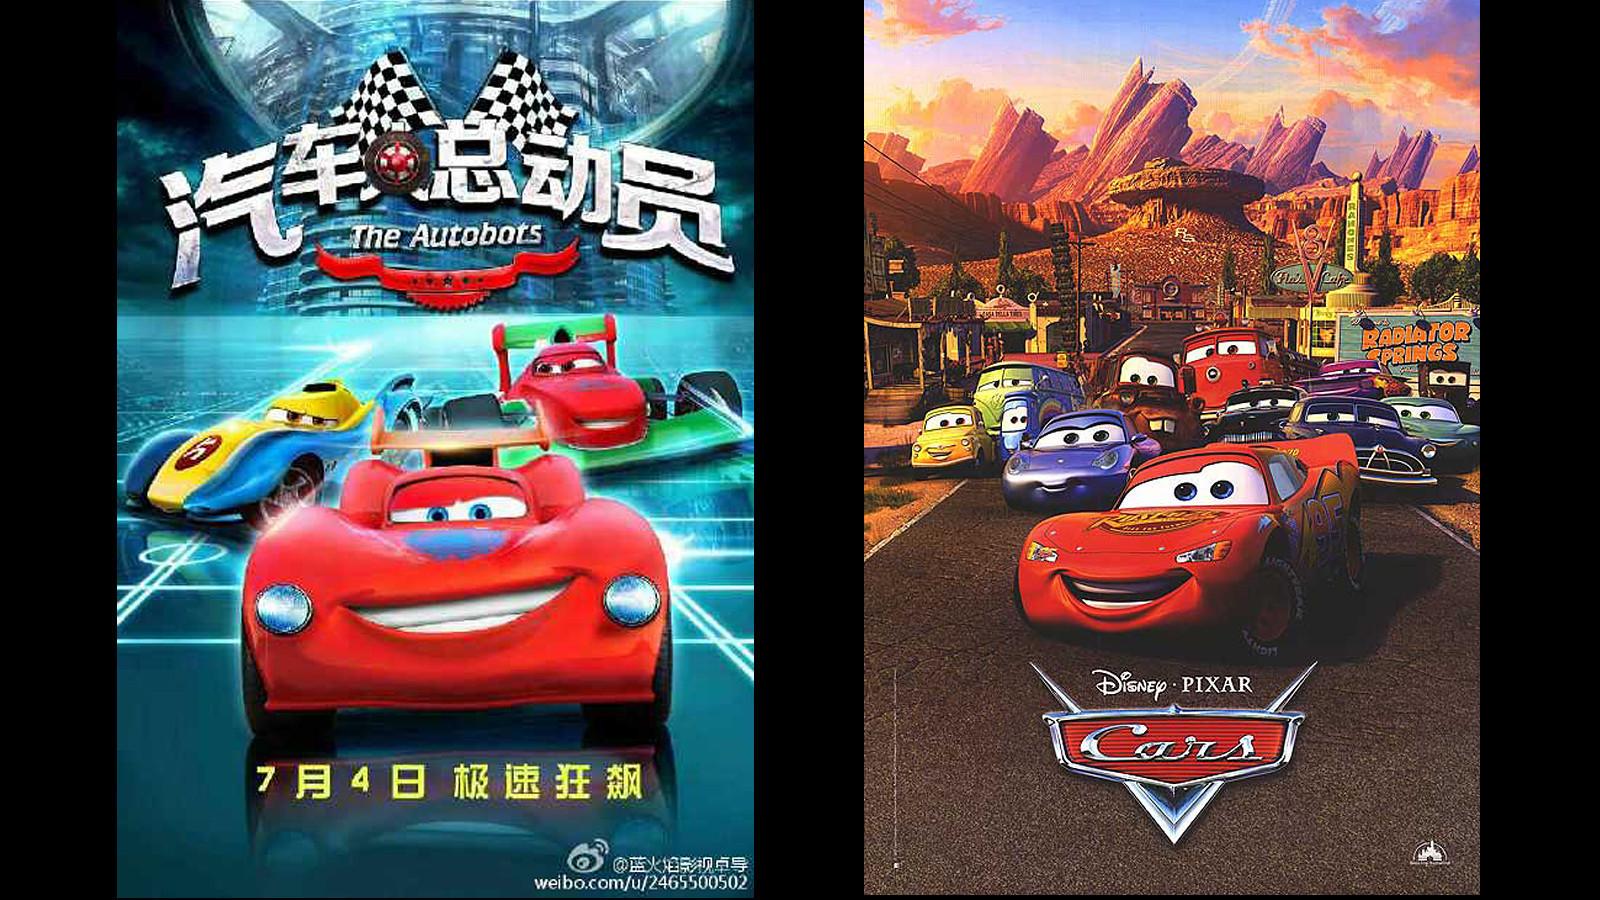 disney pixar cars cartoon - photo #37